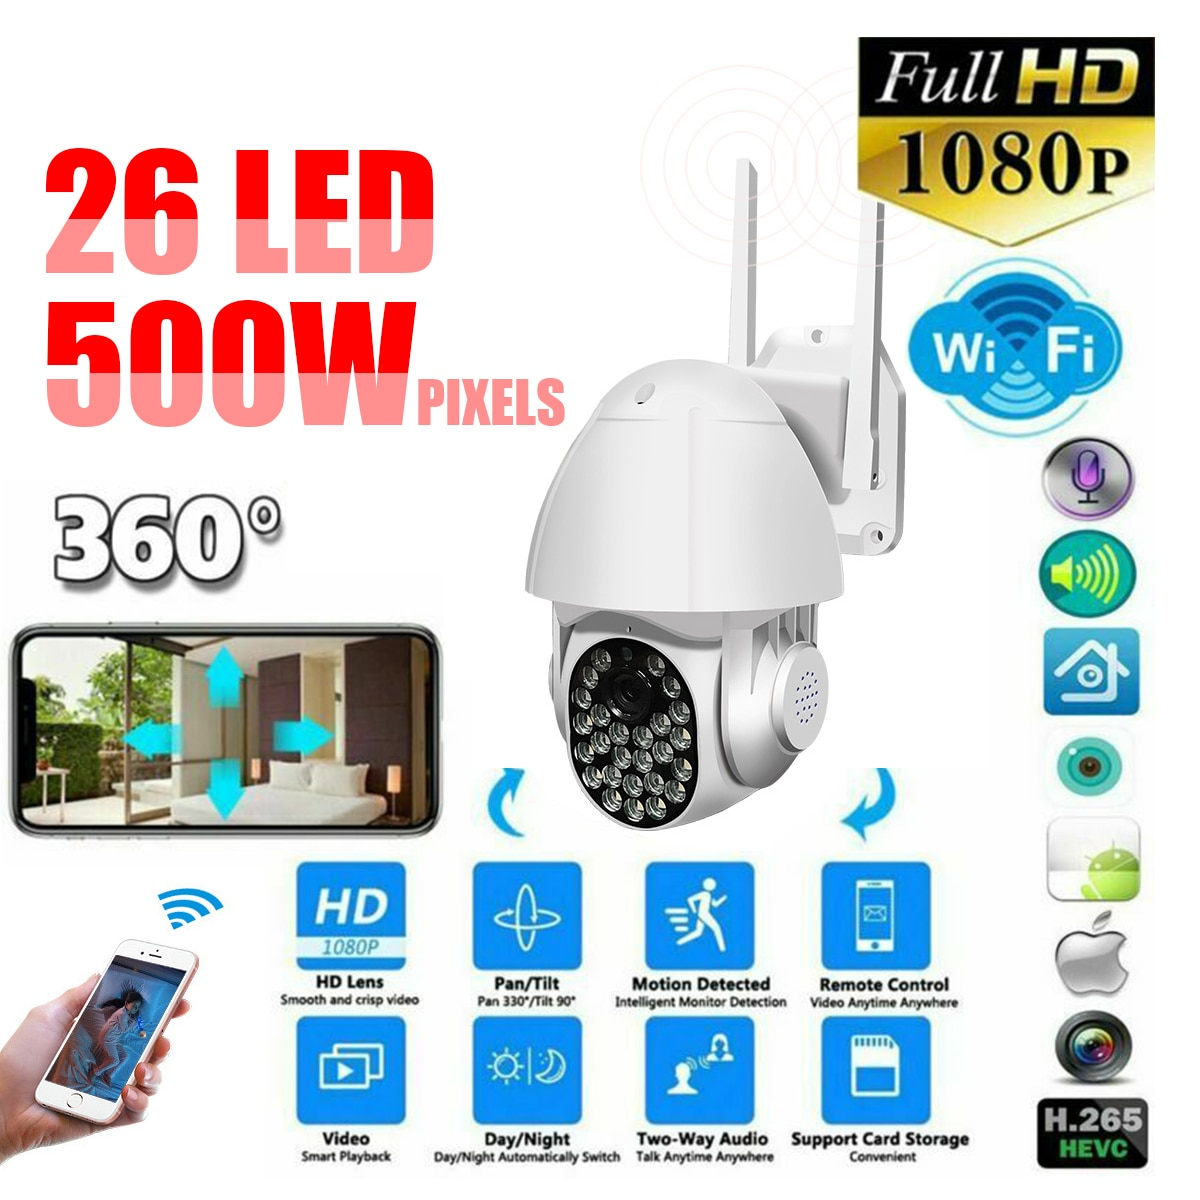 1080P PTZ واي فاي كاميرا IP في الهواء الطلق 4X التكبير الرقمي AI الإنسان كشف كاميرا لا سلكية H.265 P2P الصوت 2MP 3MP الأمن كاميرا تلفزيونات الدوائر المغلقة